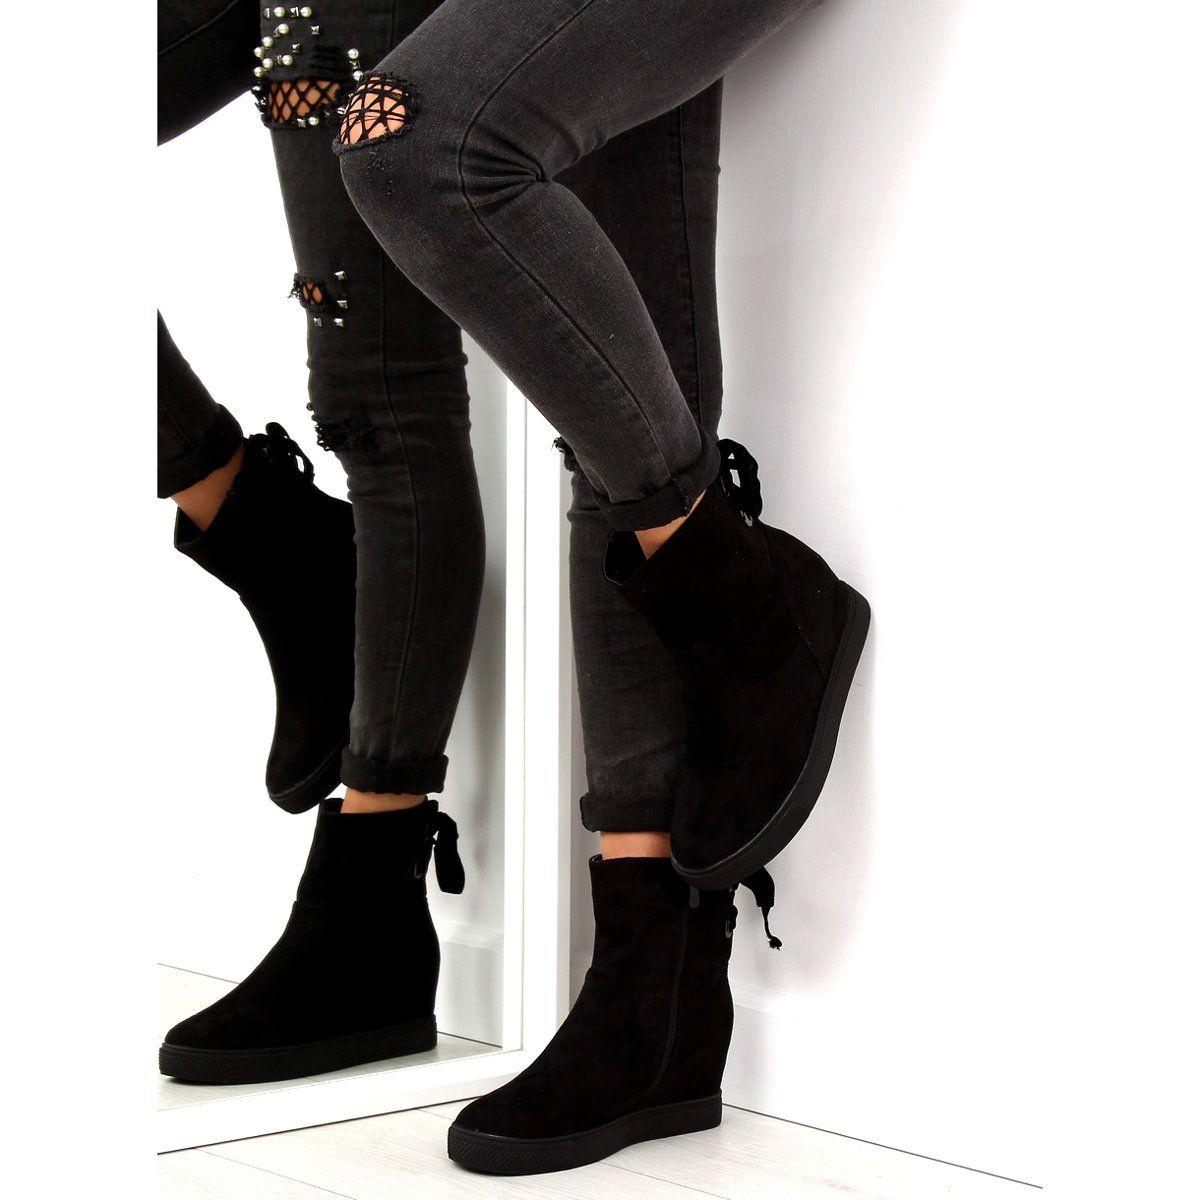 Botki Na Ukrytym Koturnie Czarne Hq886 Black Fashion Stiletto Boot Ankle Boot